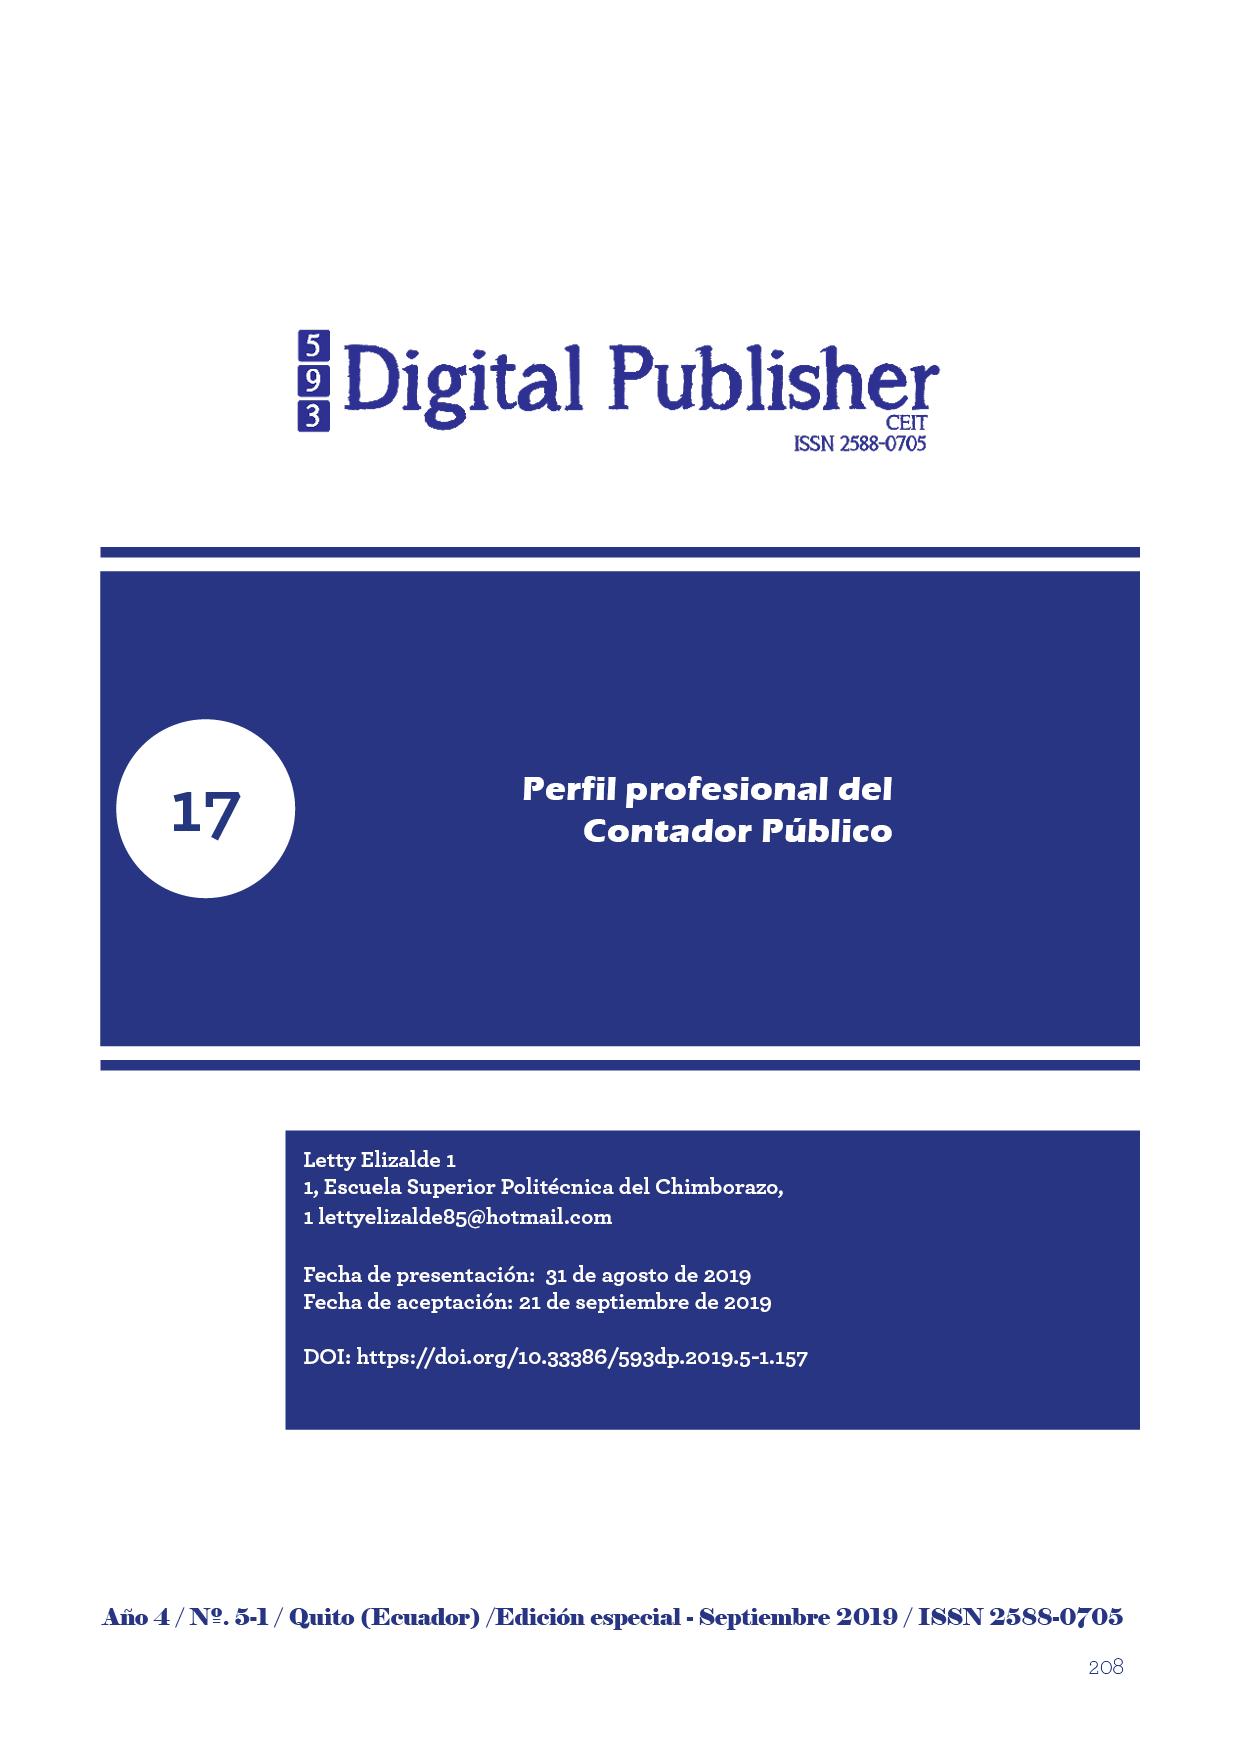 Perfil Profesional Del Contador Publico 593 Digital Publisher Ceit